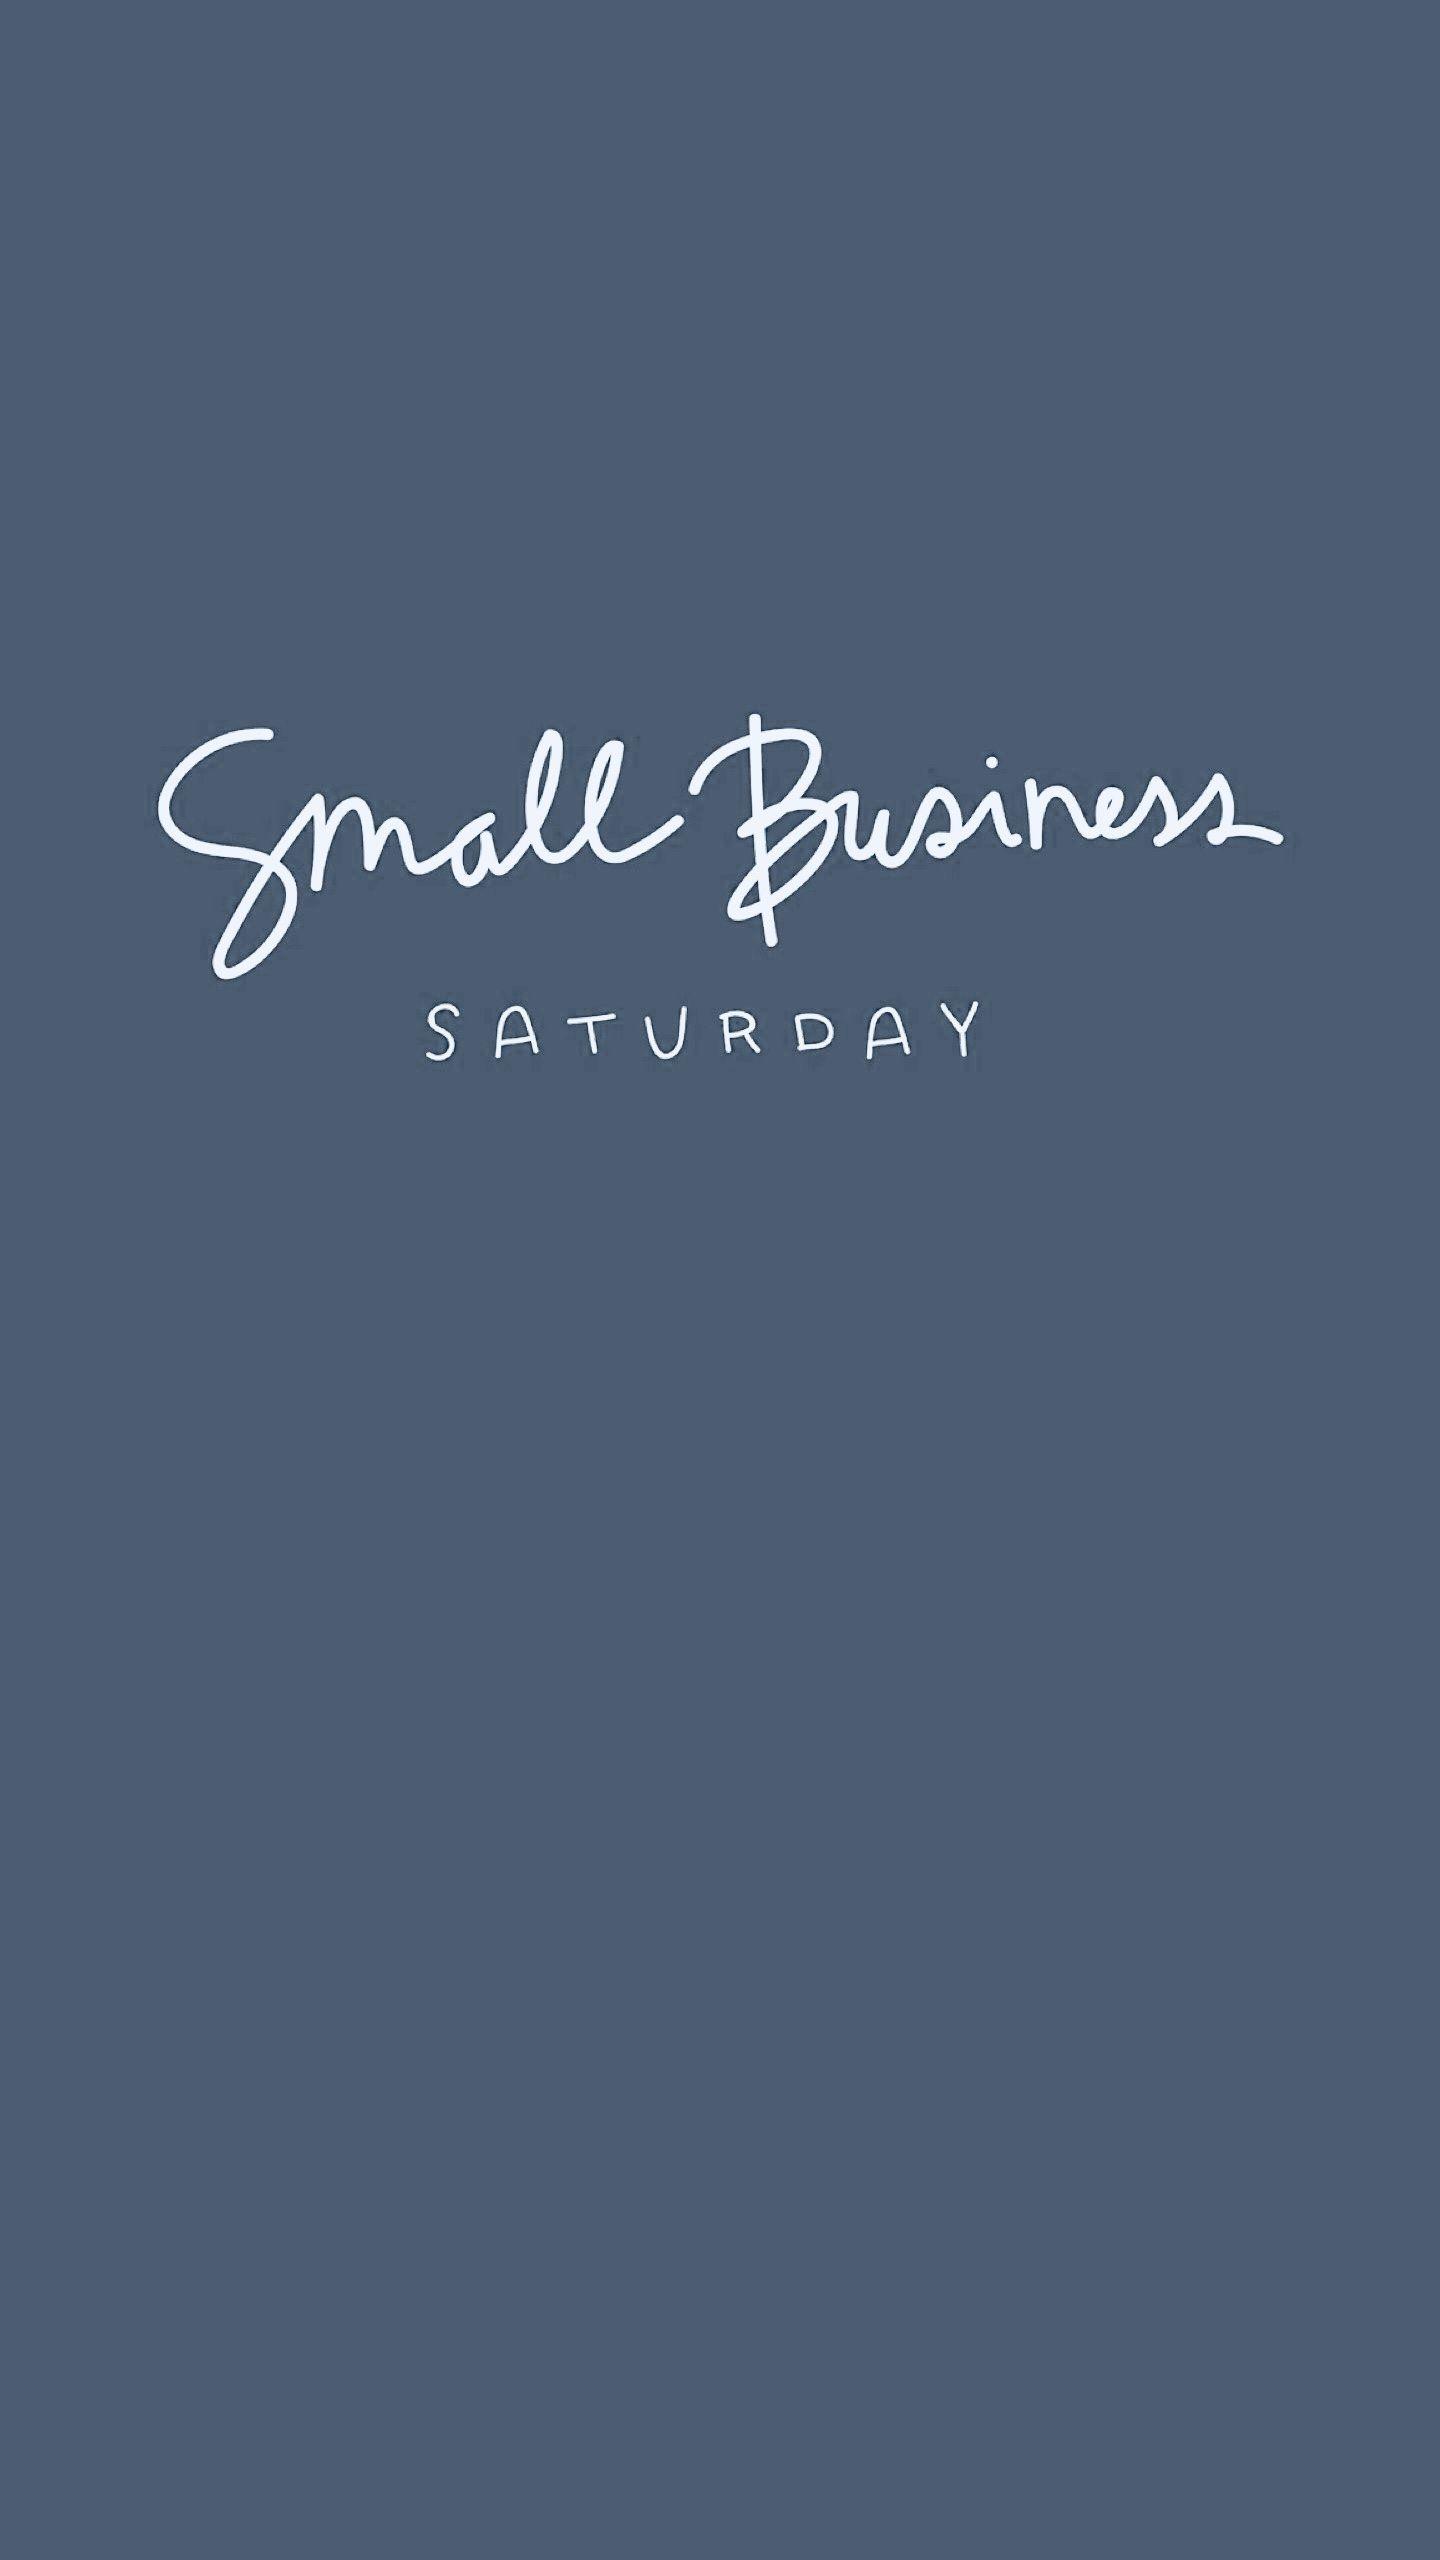 1440x2560 Free Small Biz Saturday Graphics Handdrawn By Brand Designer